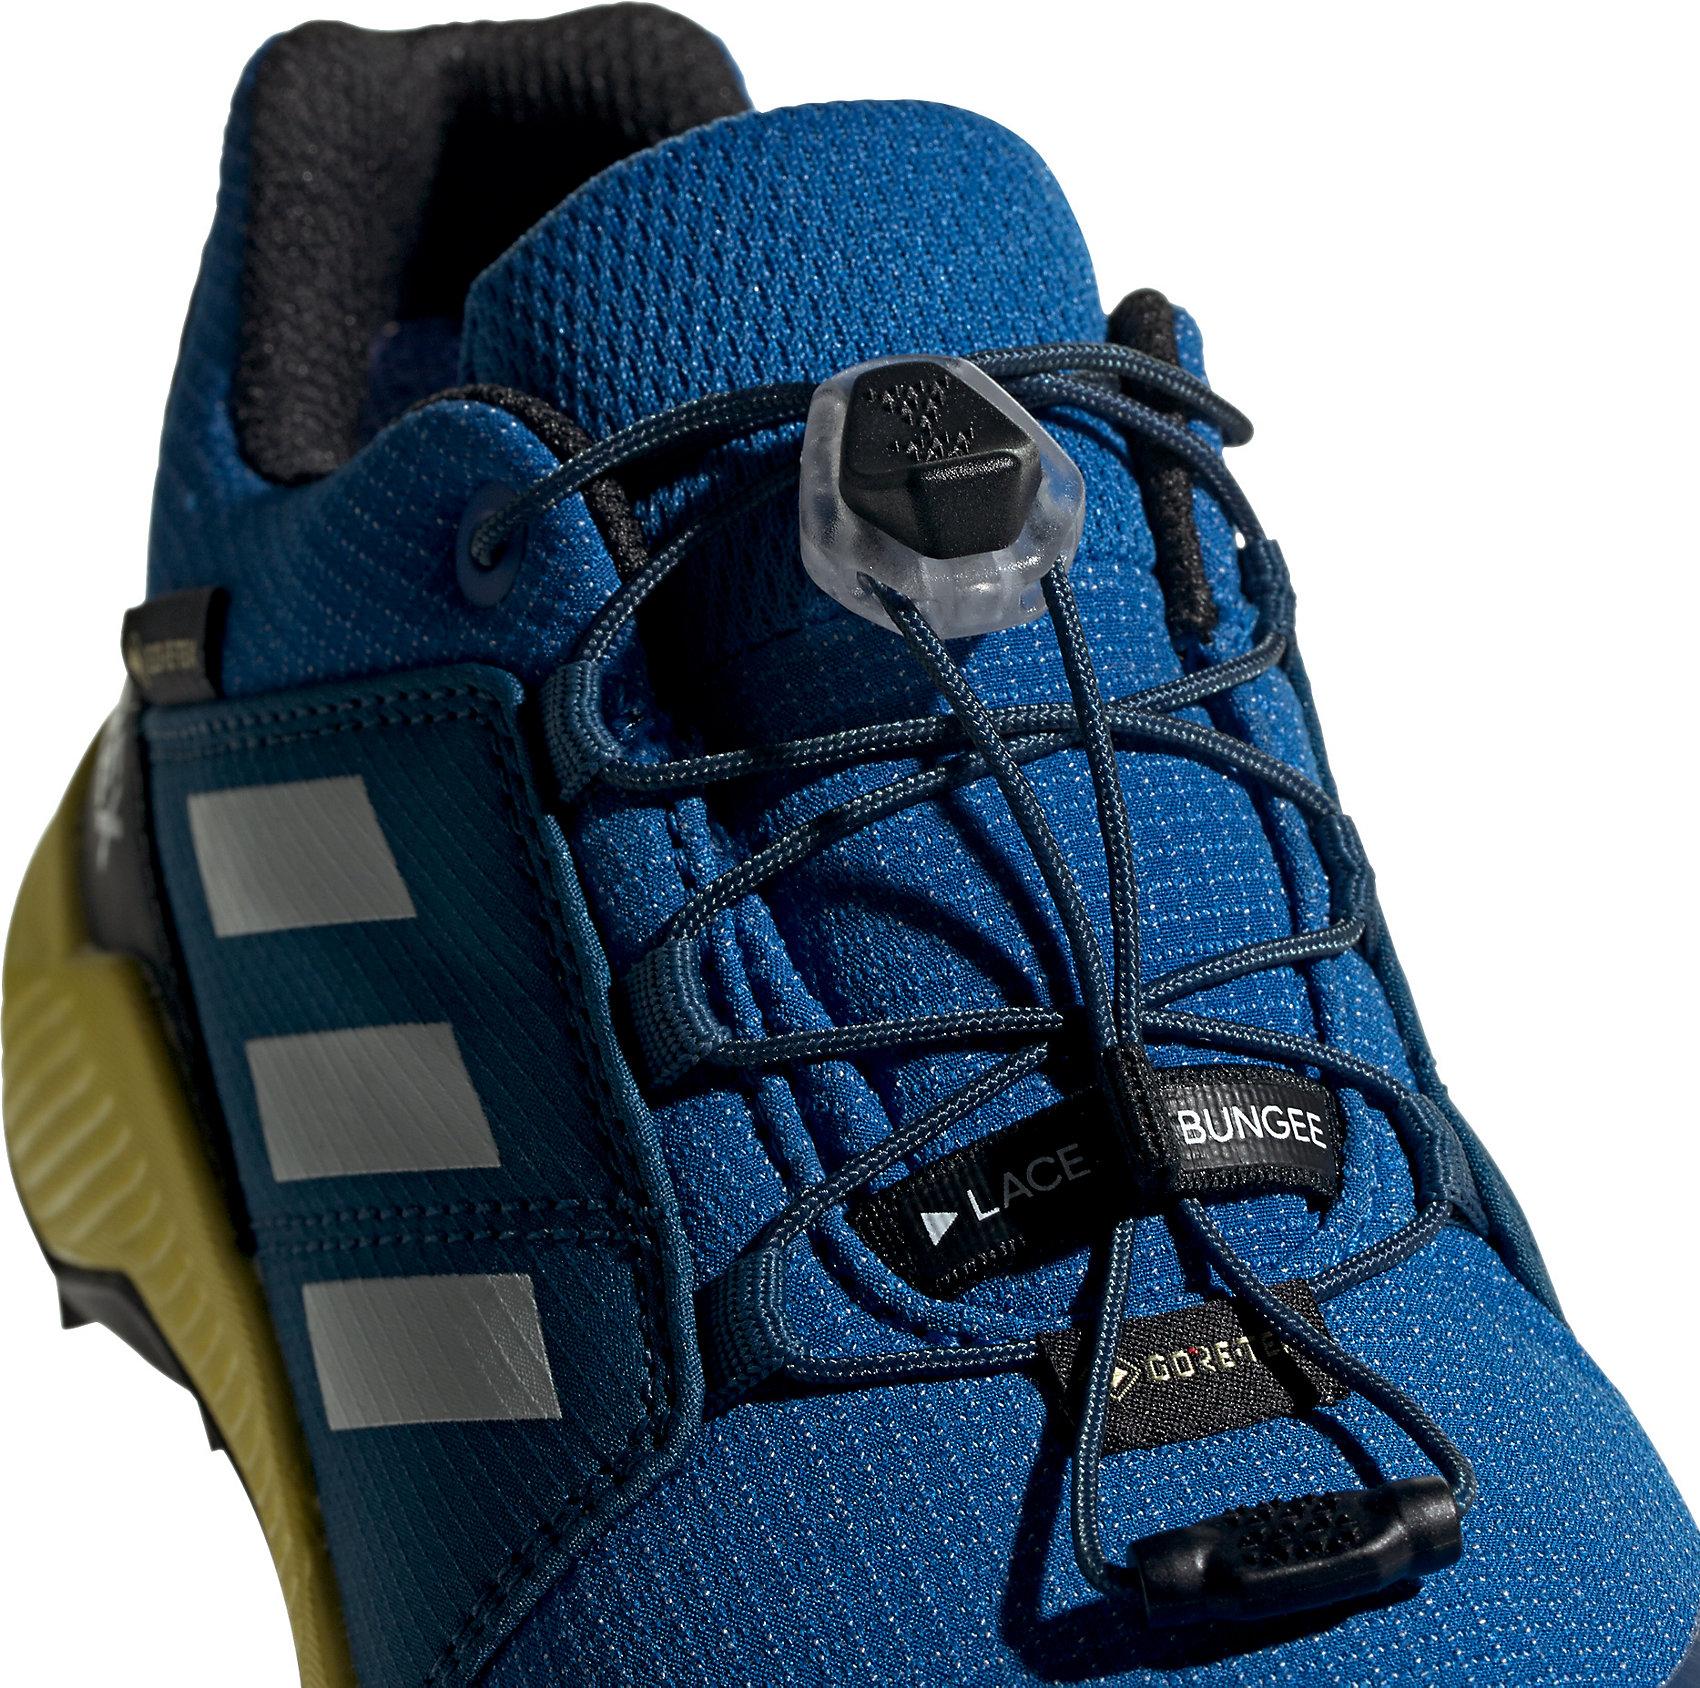 Details zu adidas Trekkingschuhe Terrex GTX K mit adiPRENE Technologie AQ5651 Sportschuhe